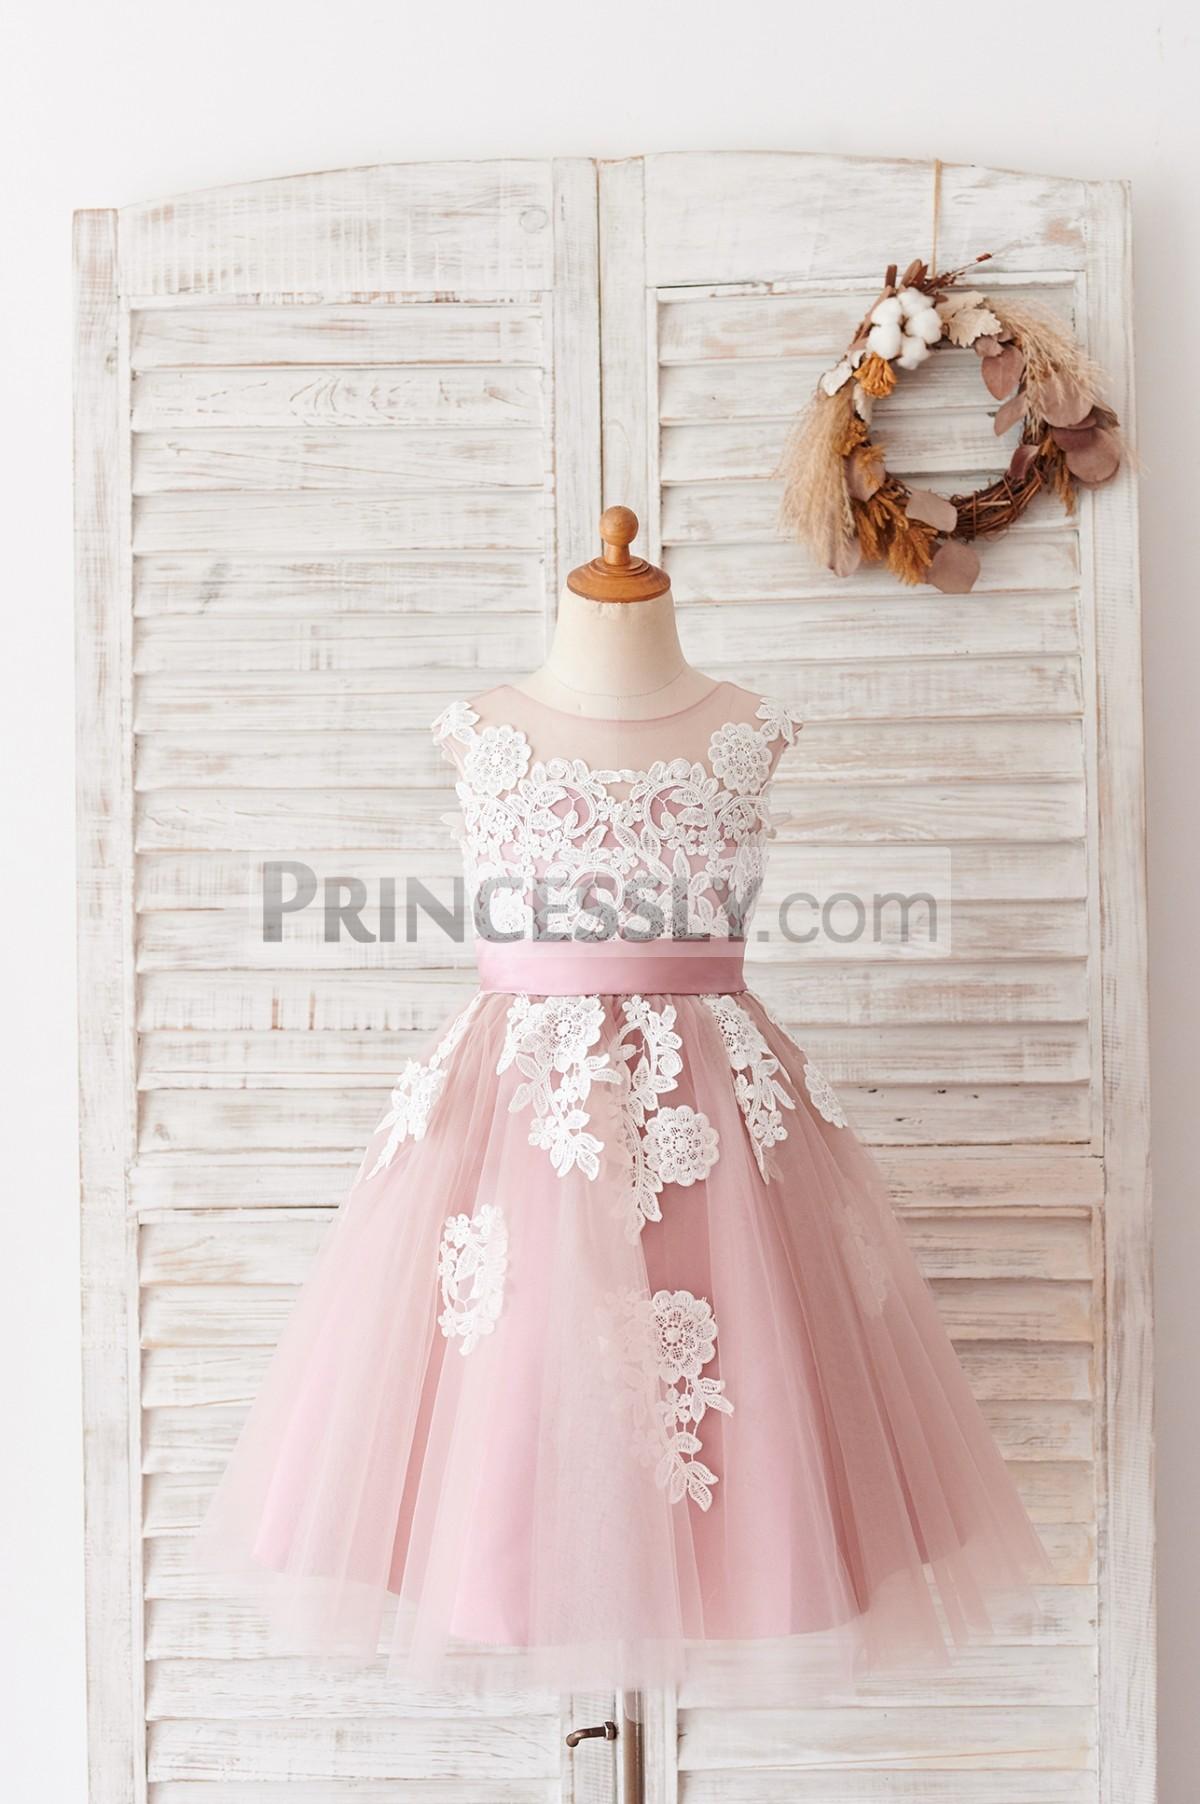 Princessly.com-K1004055-Ivory Lace Mauve/Silver Gray Tulle Wedding Flower Girl Dress-31